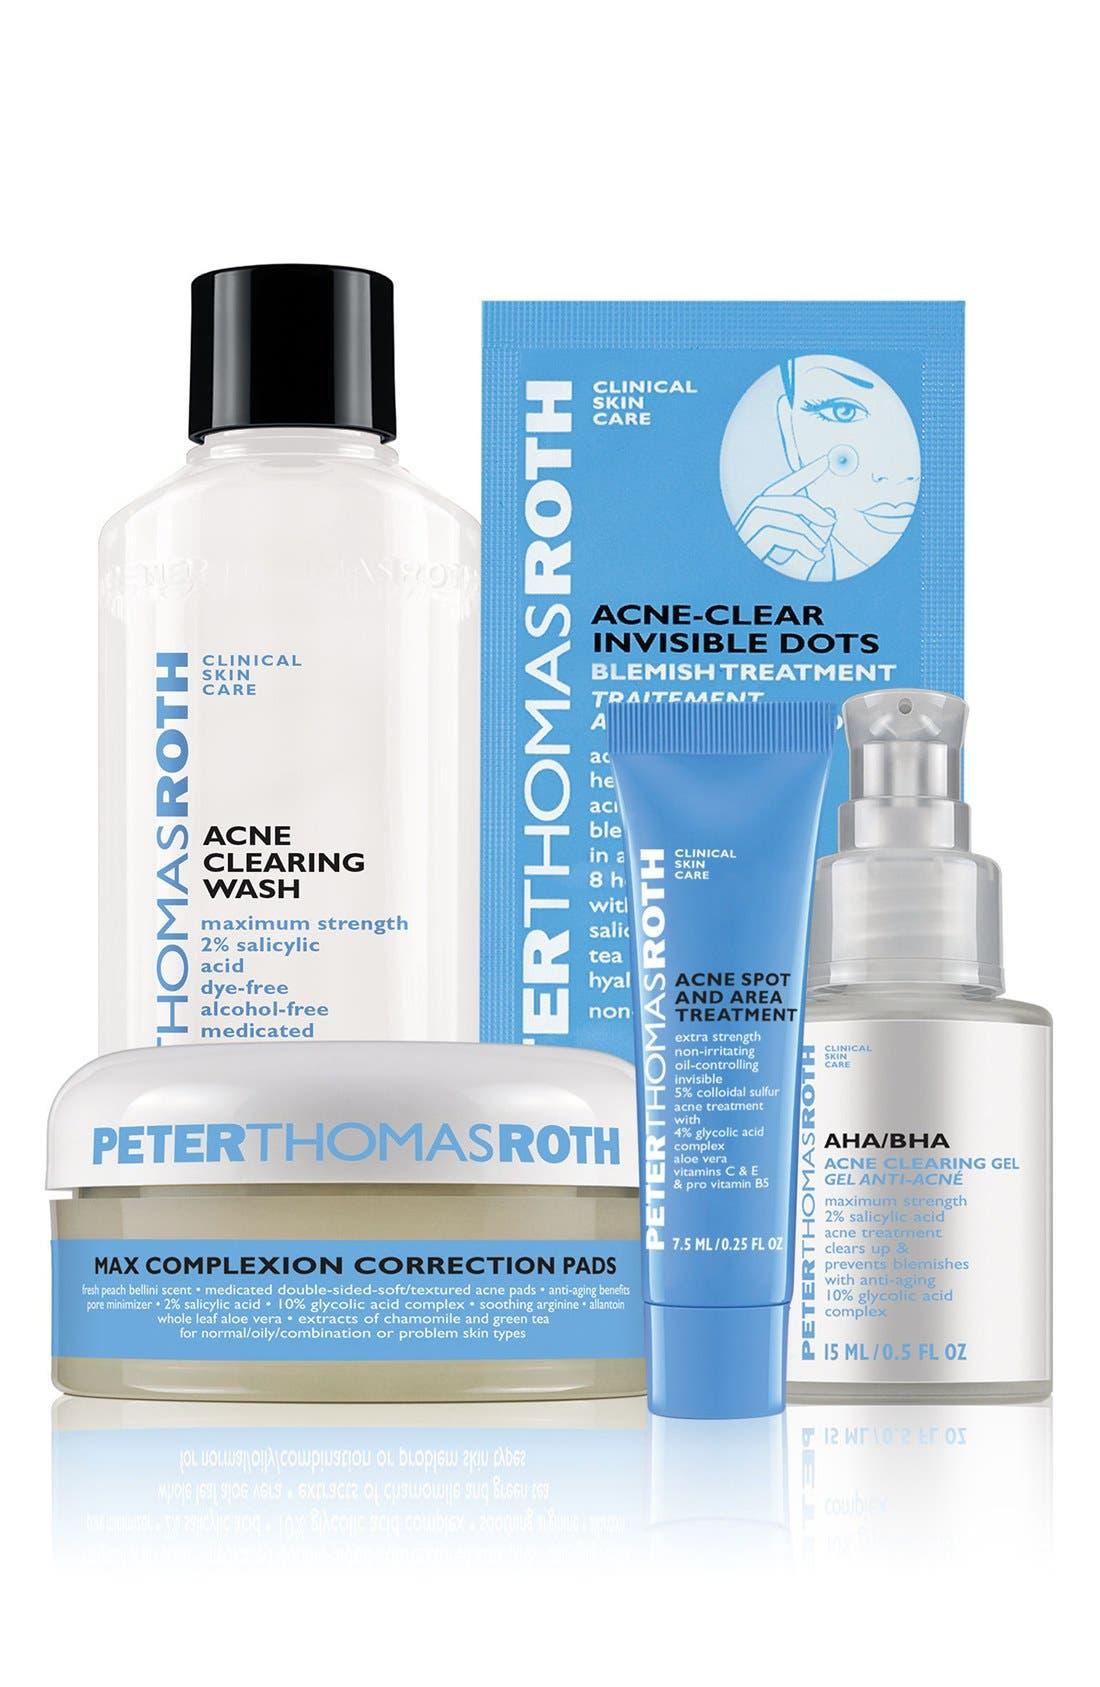 Peter Thomas Roth Acne System Kit